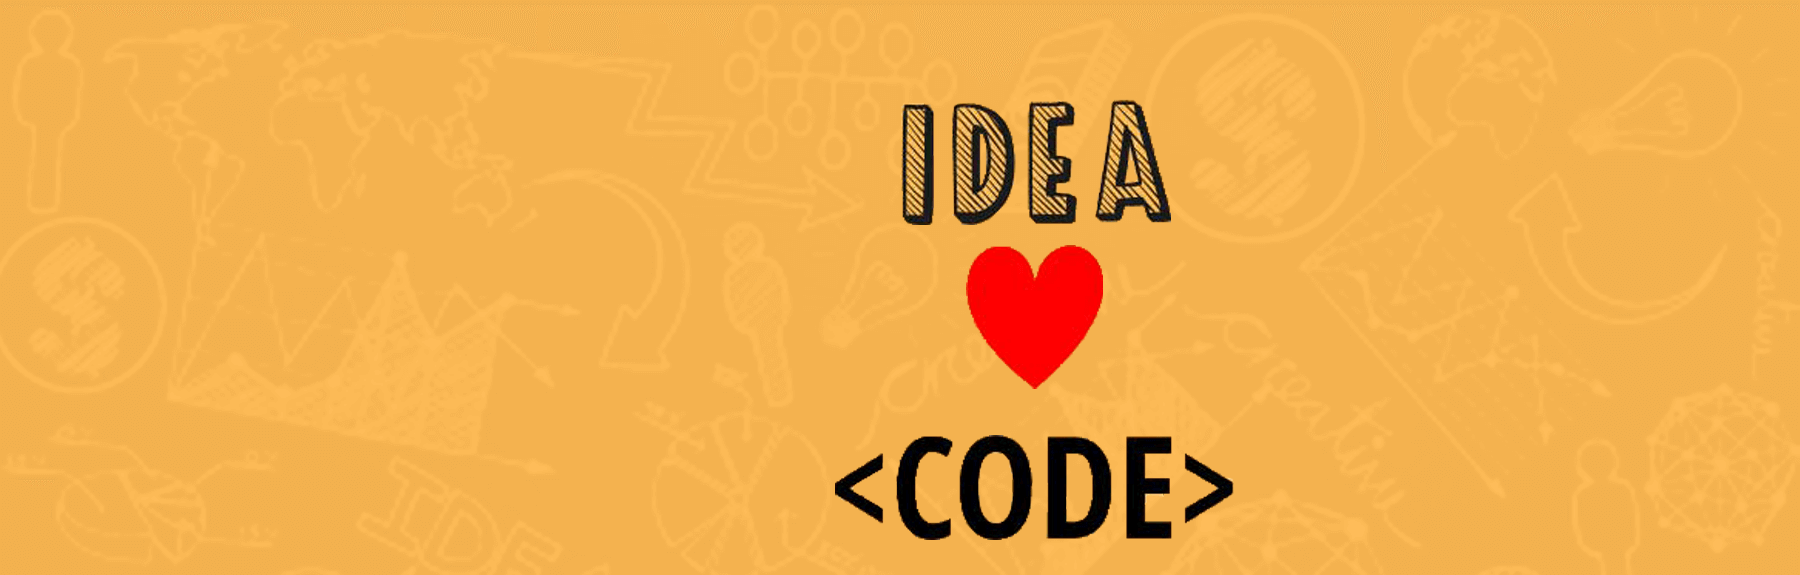 thinking-design-development-process-1